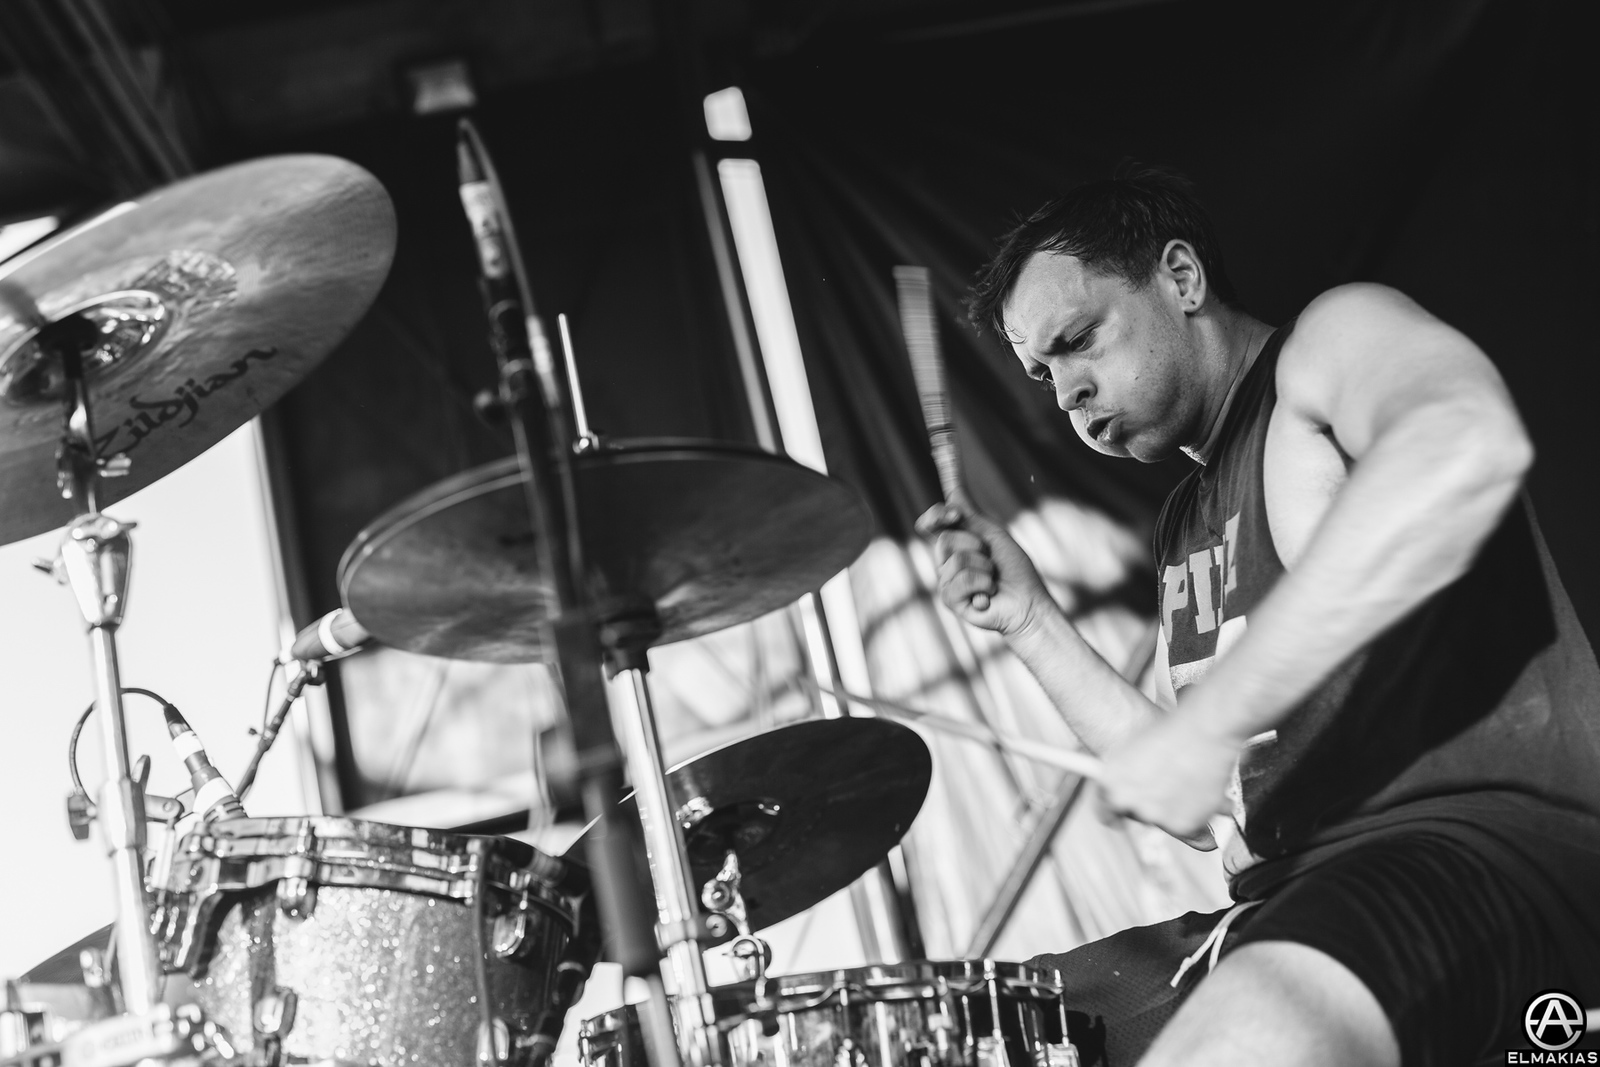 Jake Duhaime of Citizen live at Vans Warped Tour 2015 by Adam Elmakias